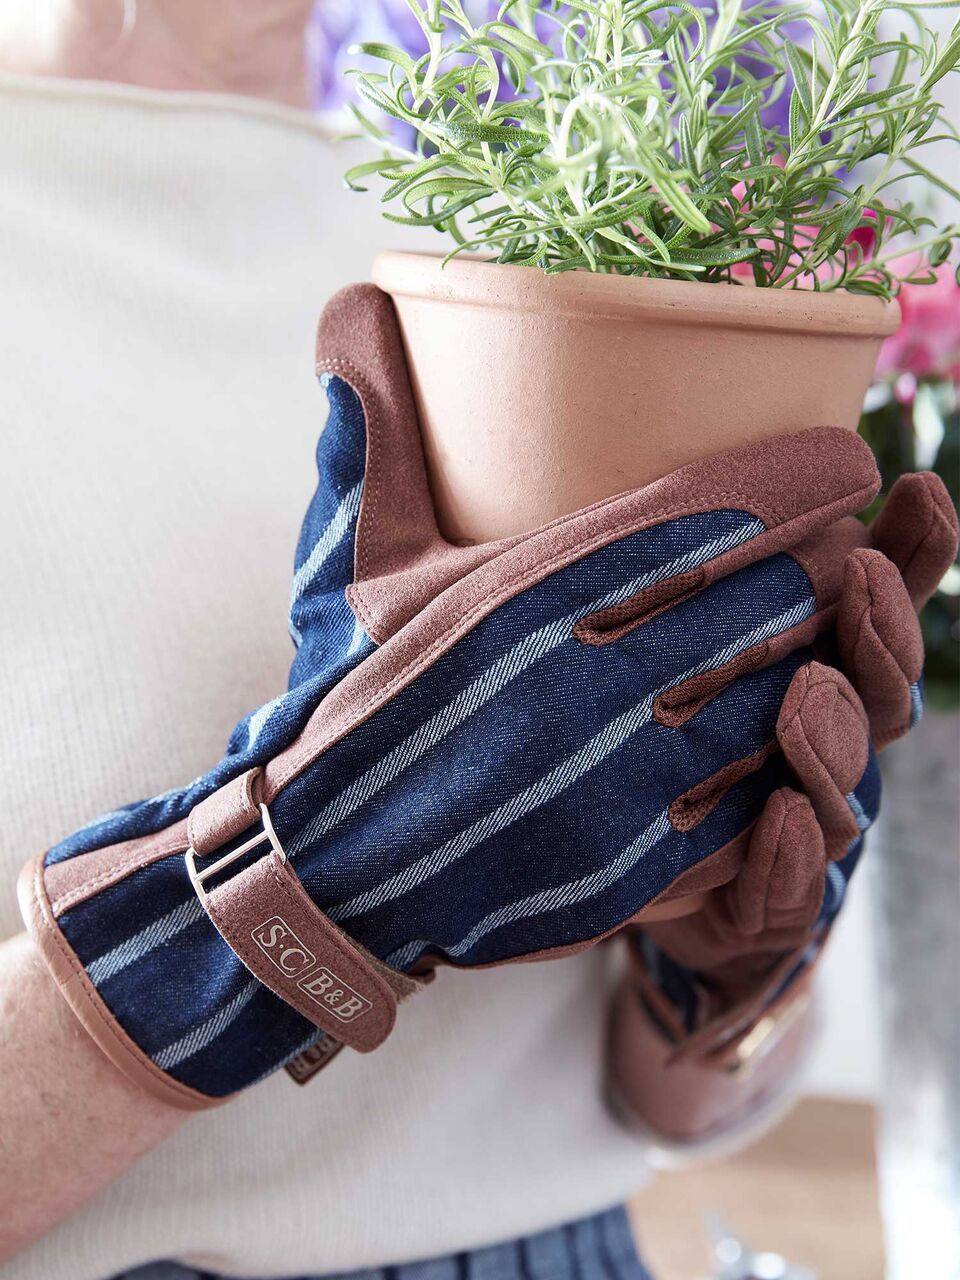 Comfortable Designer Gardening Gloves Images   Landscaping Ideas .